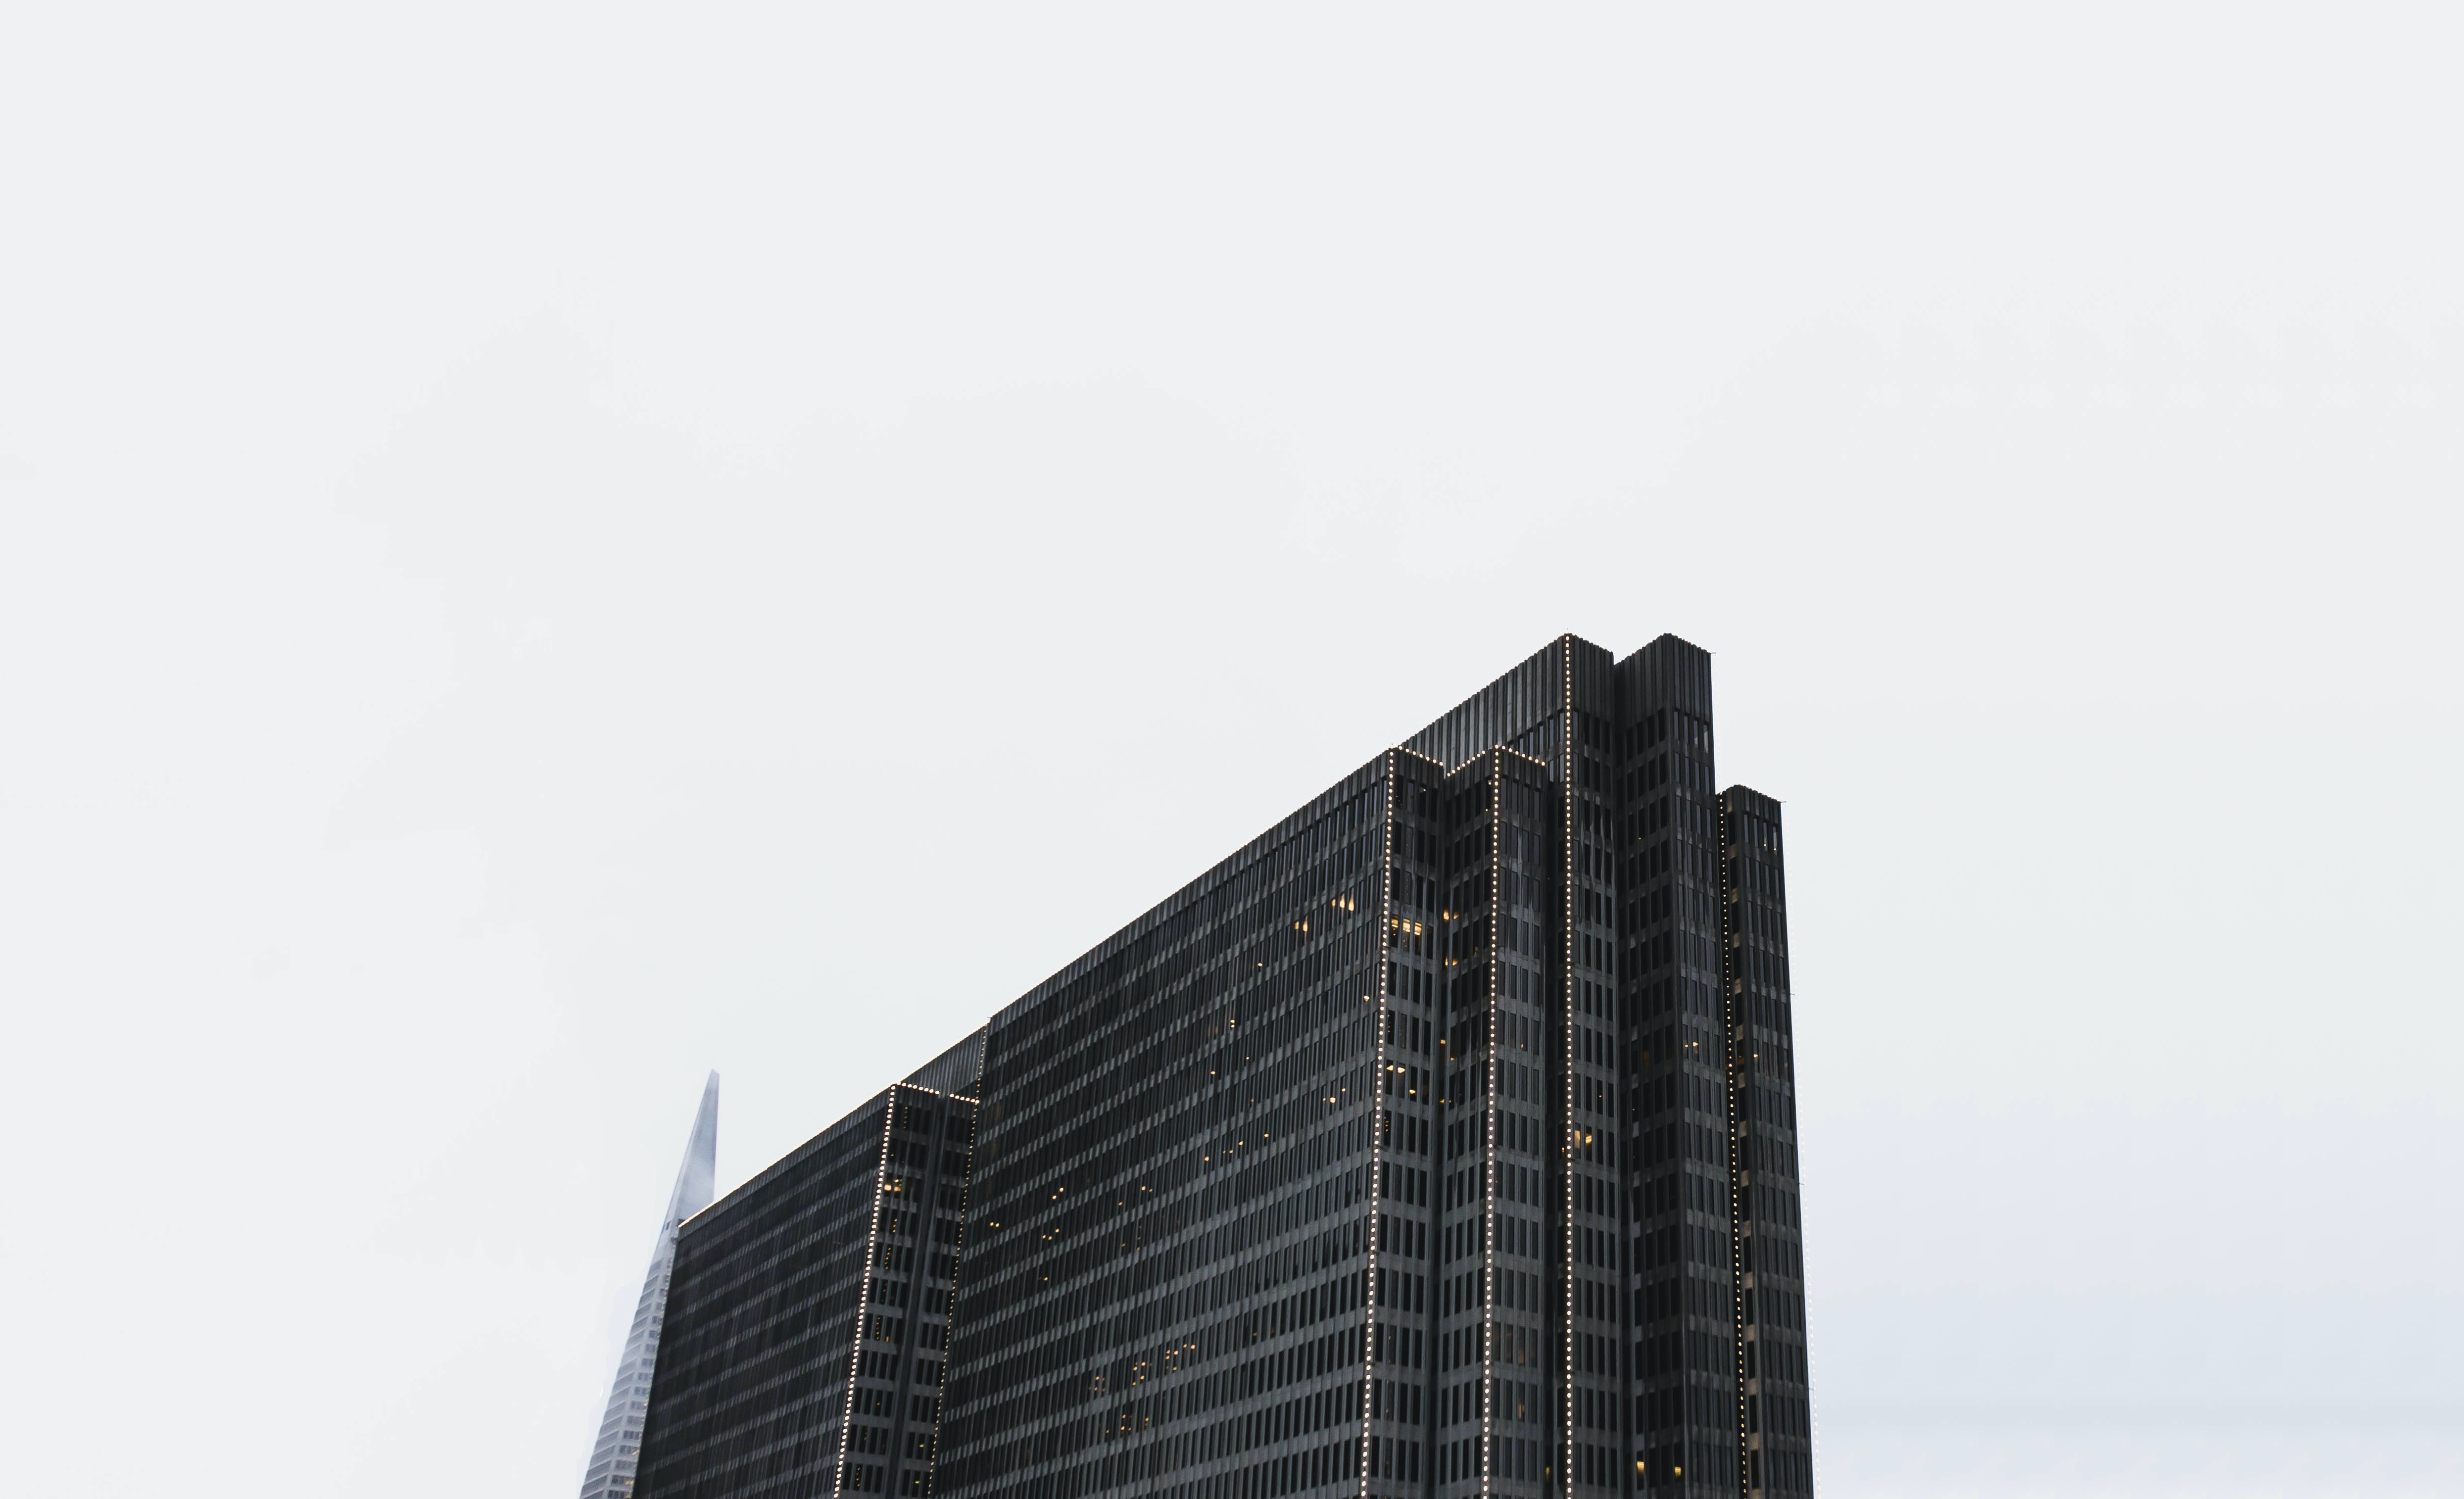 bird's eye views of building under cloudy sky